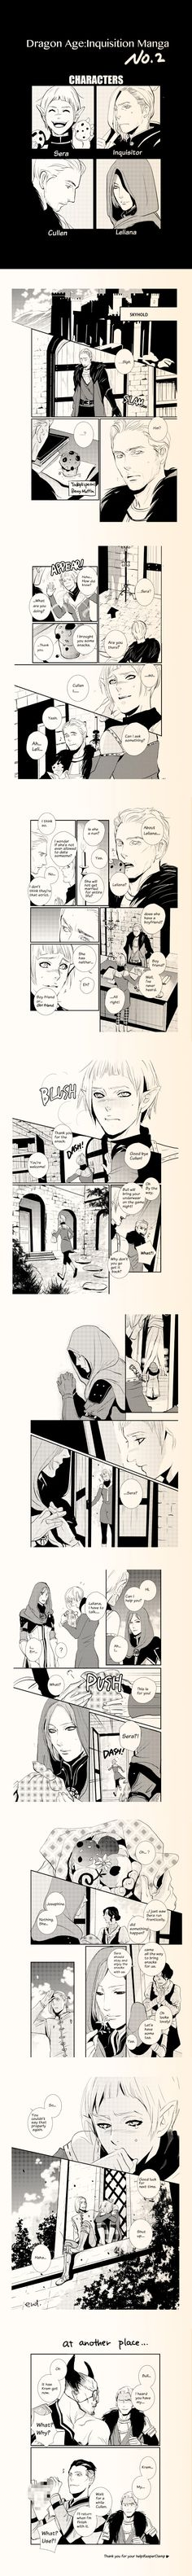 DragonAge:inquisition-manga vol.2 by go-ma on DeviantArt